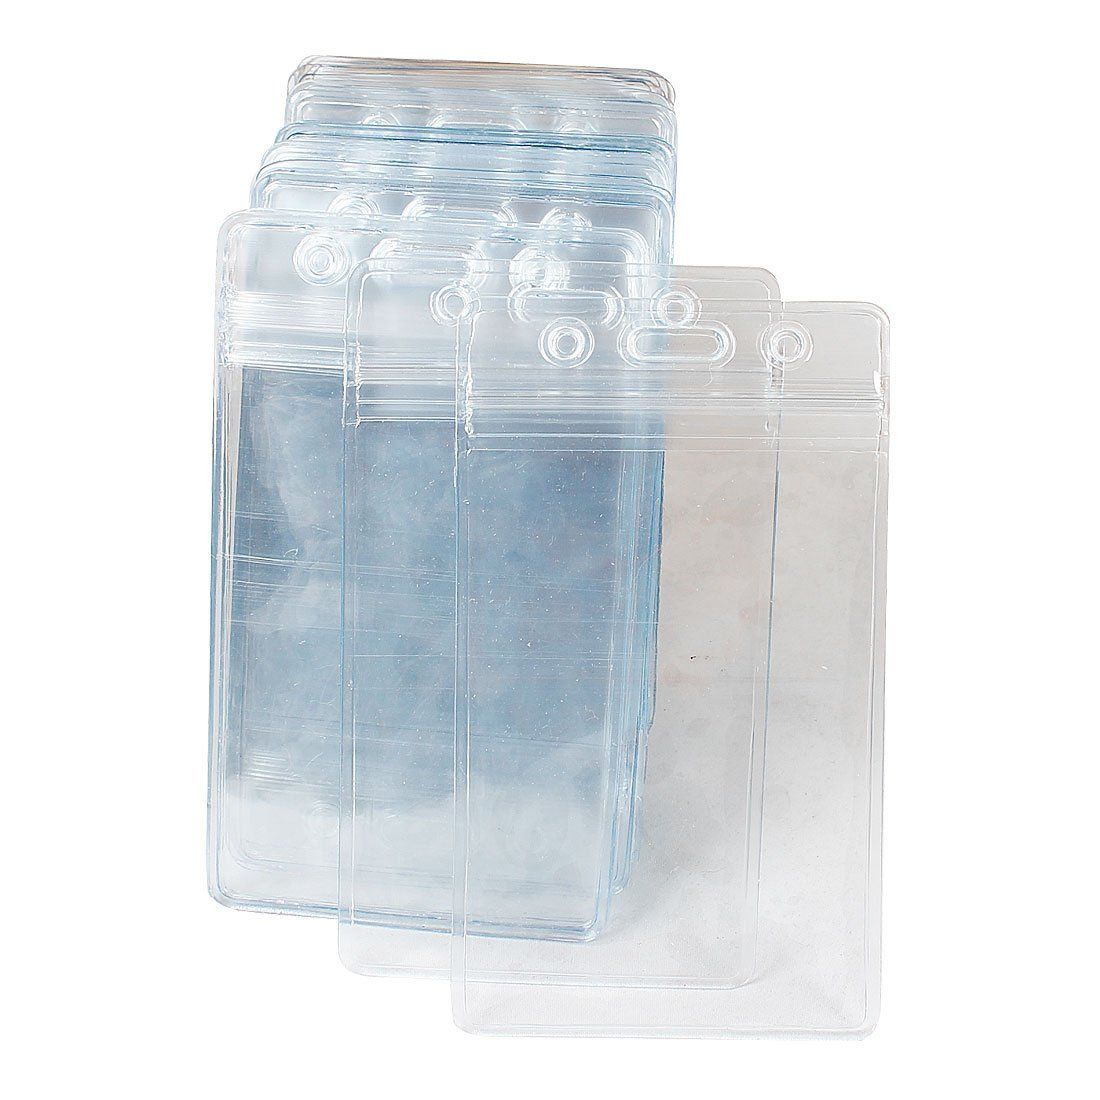 Abordable 50 Pcs En Plastique Transparent Vertical Nom Tag Badge ID Porte-Cartes